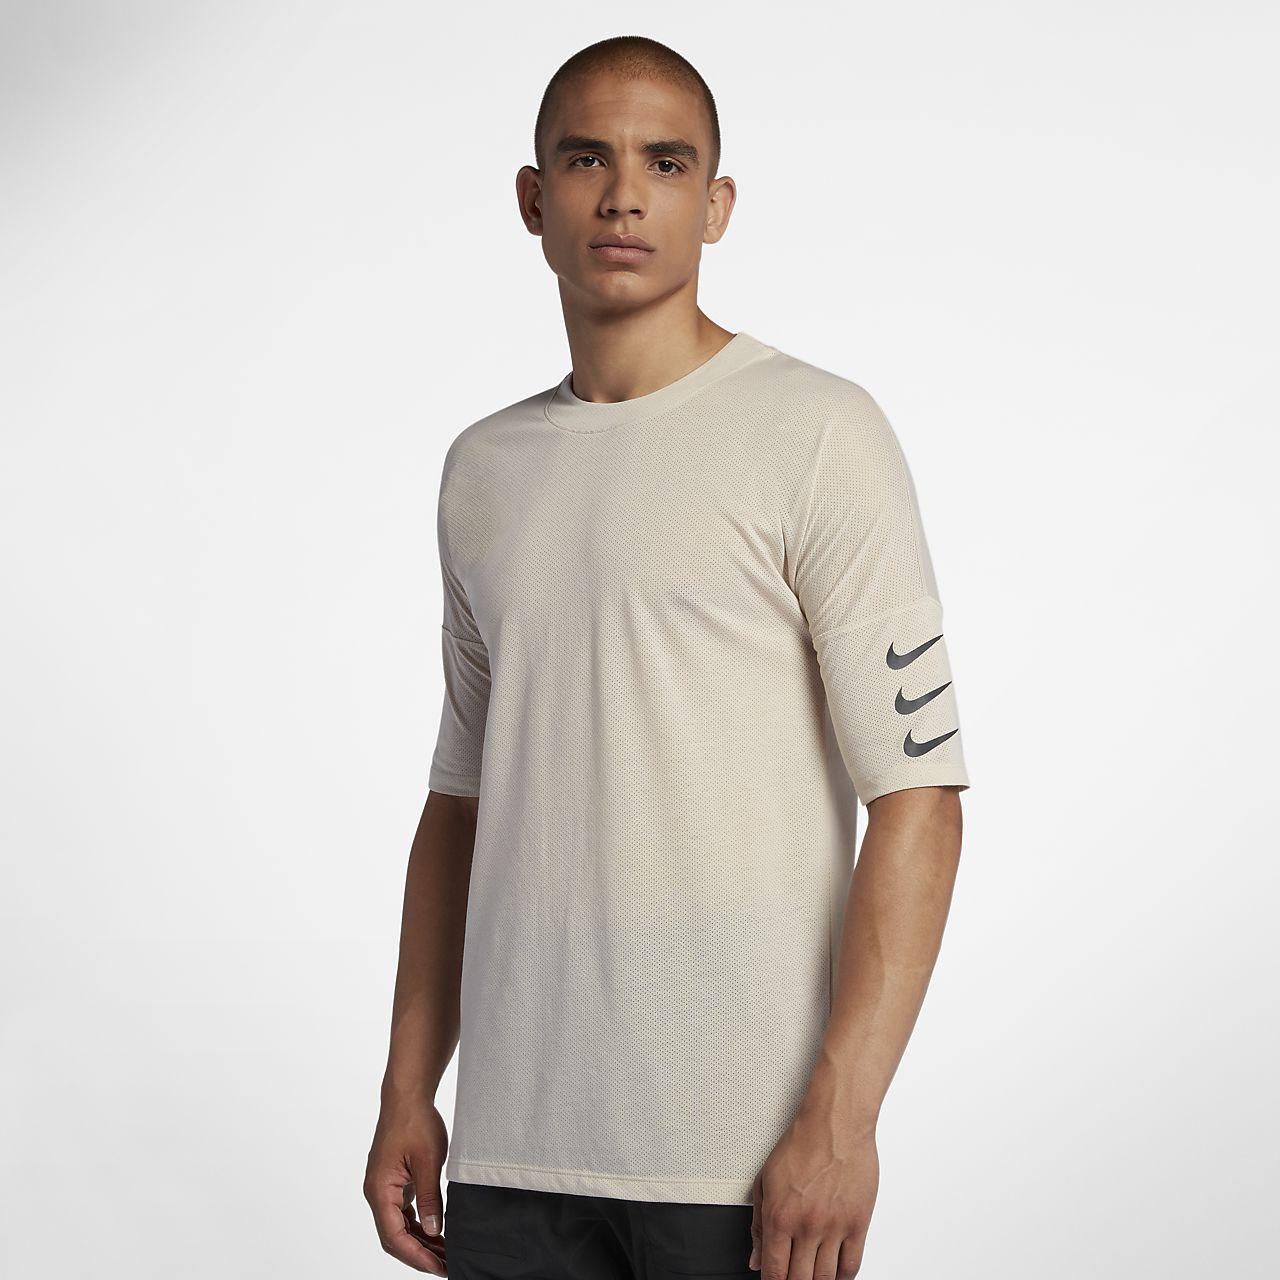 c5680c5c1c4f02 Nike Rise 365 Men s Half-Sleeve Running Top. Nike.com NZ